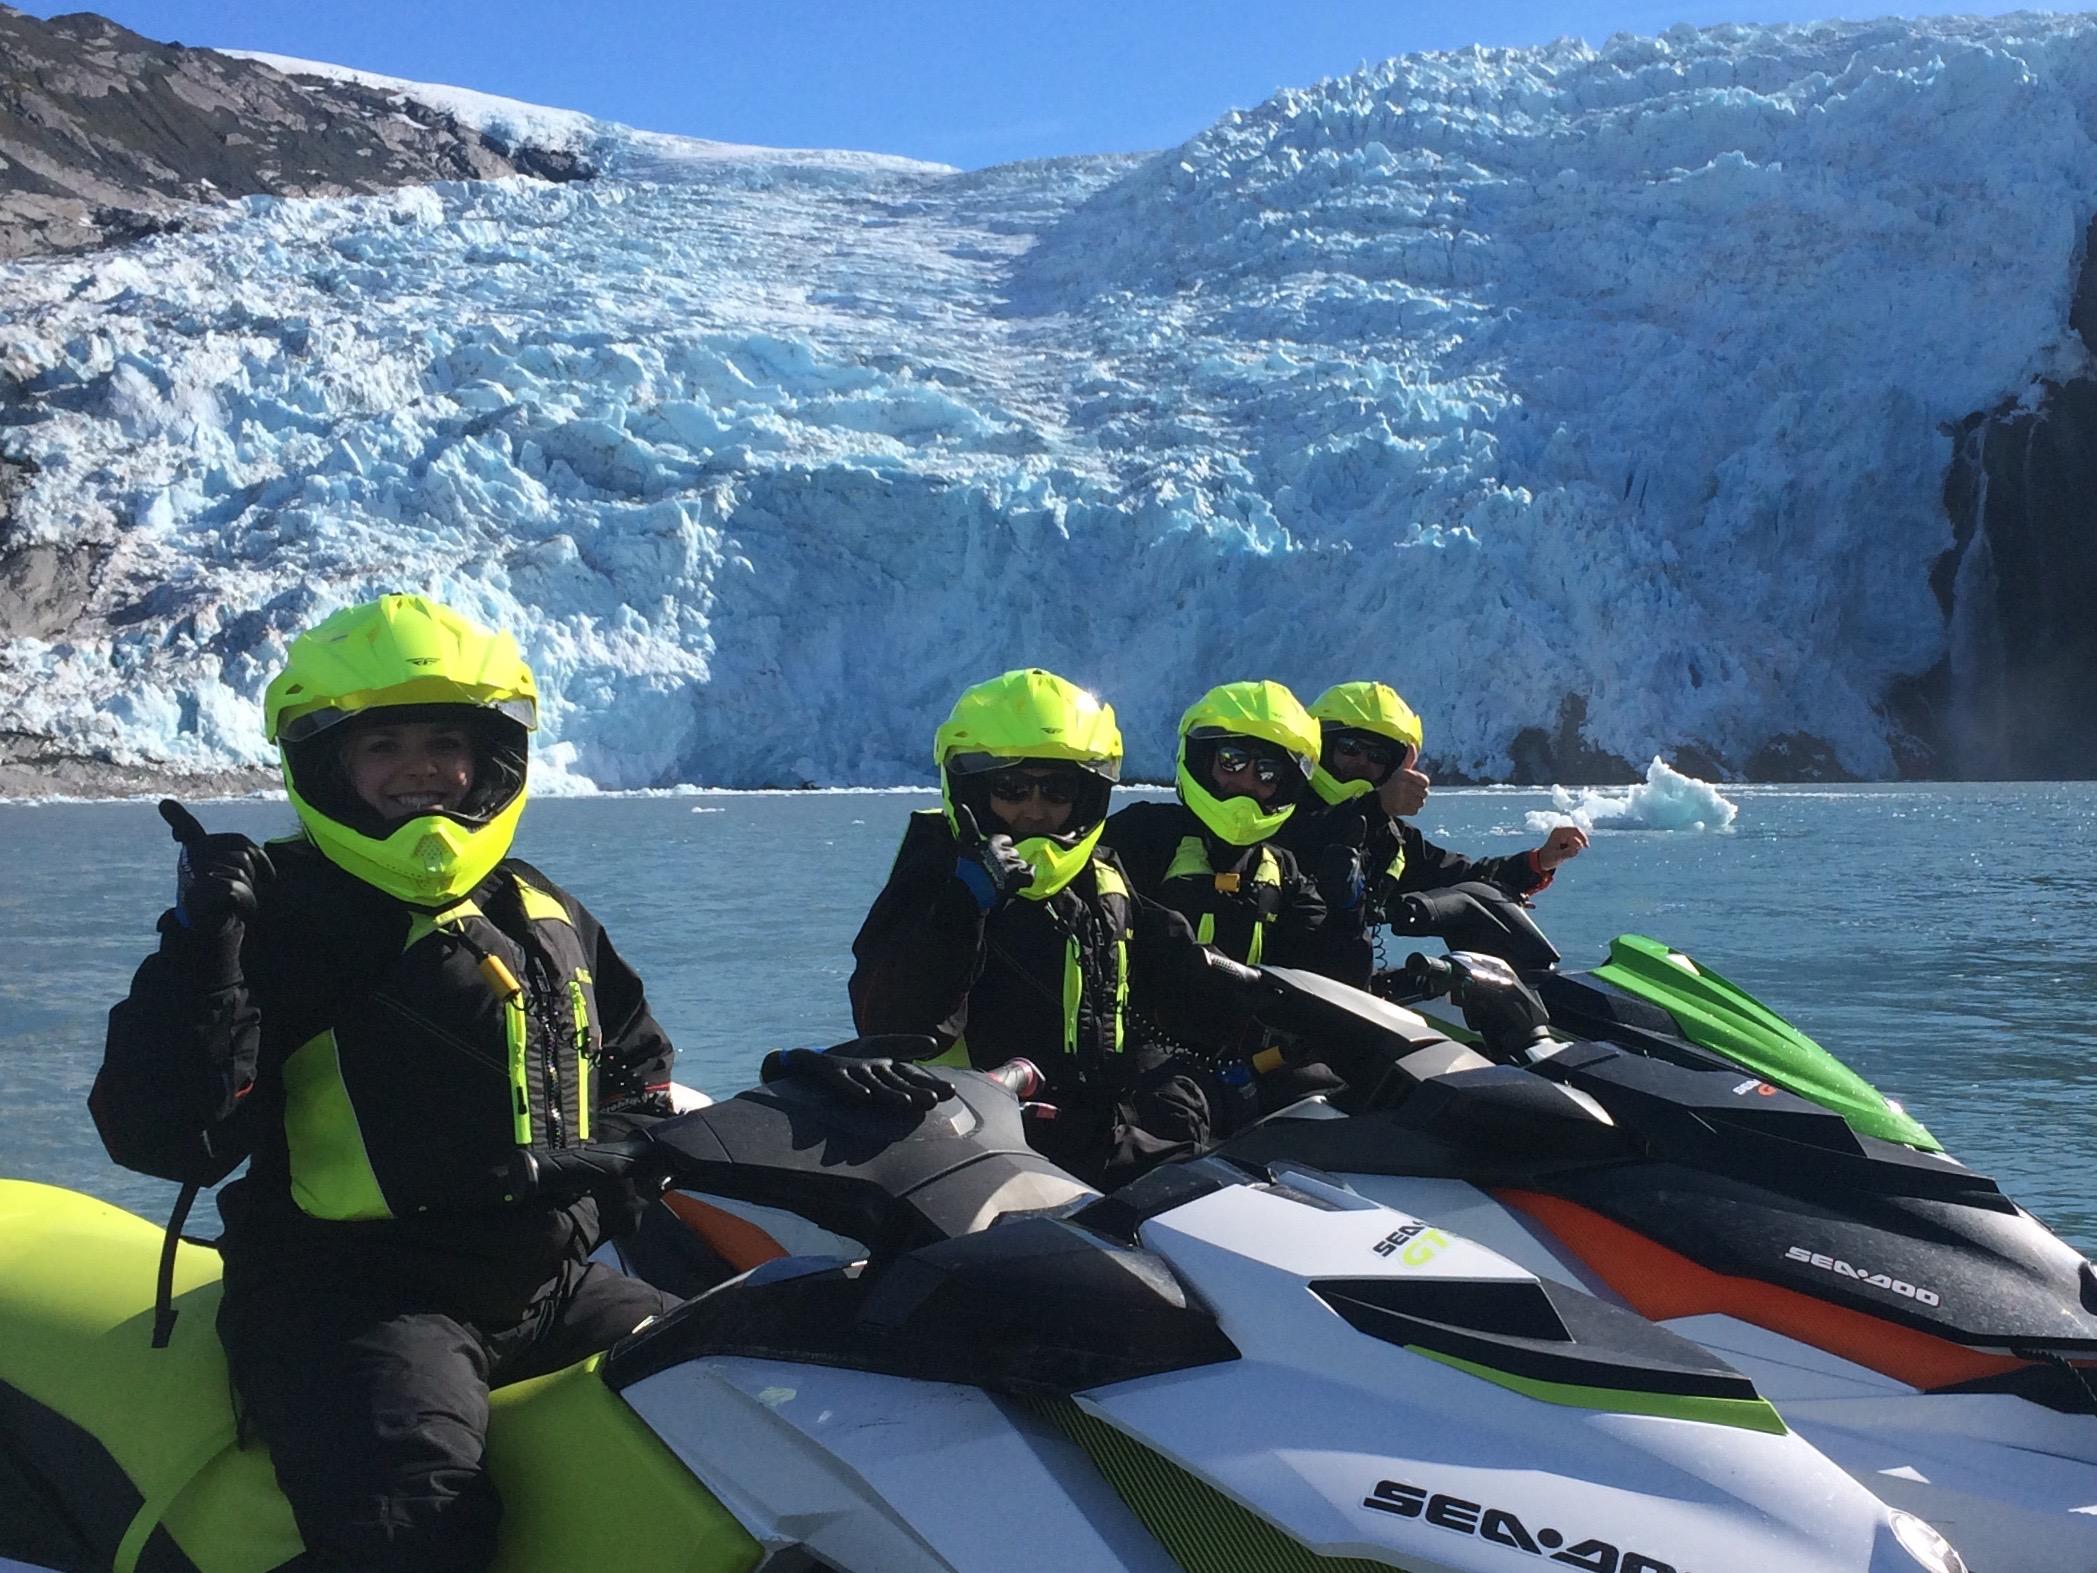 Alaska Adventure Tours like no other with Glacier Jet Ski Adventures